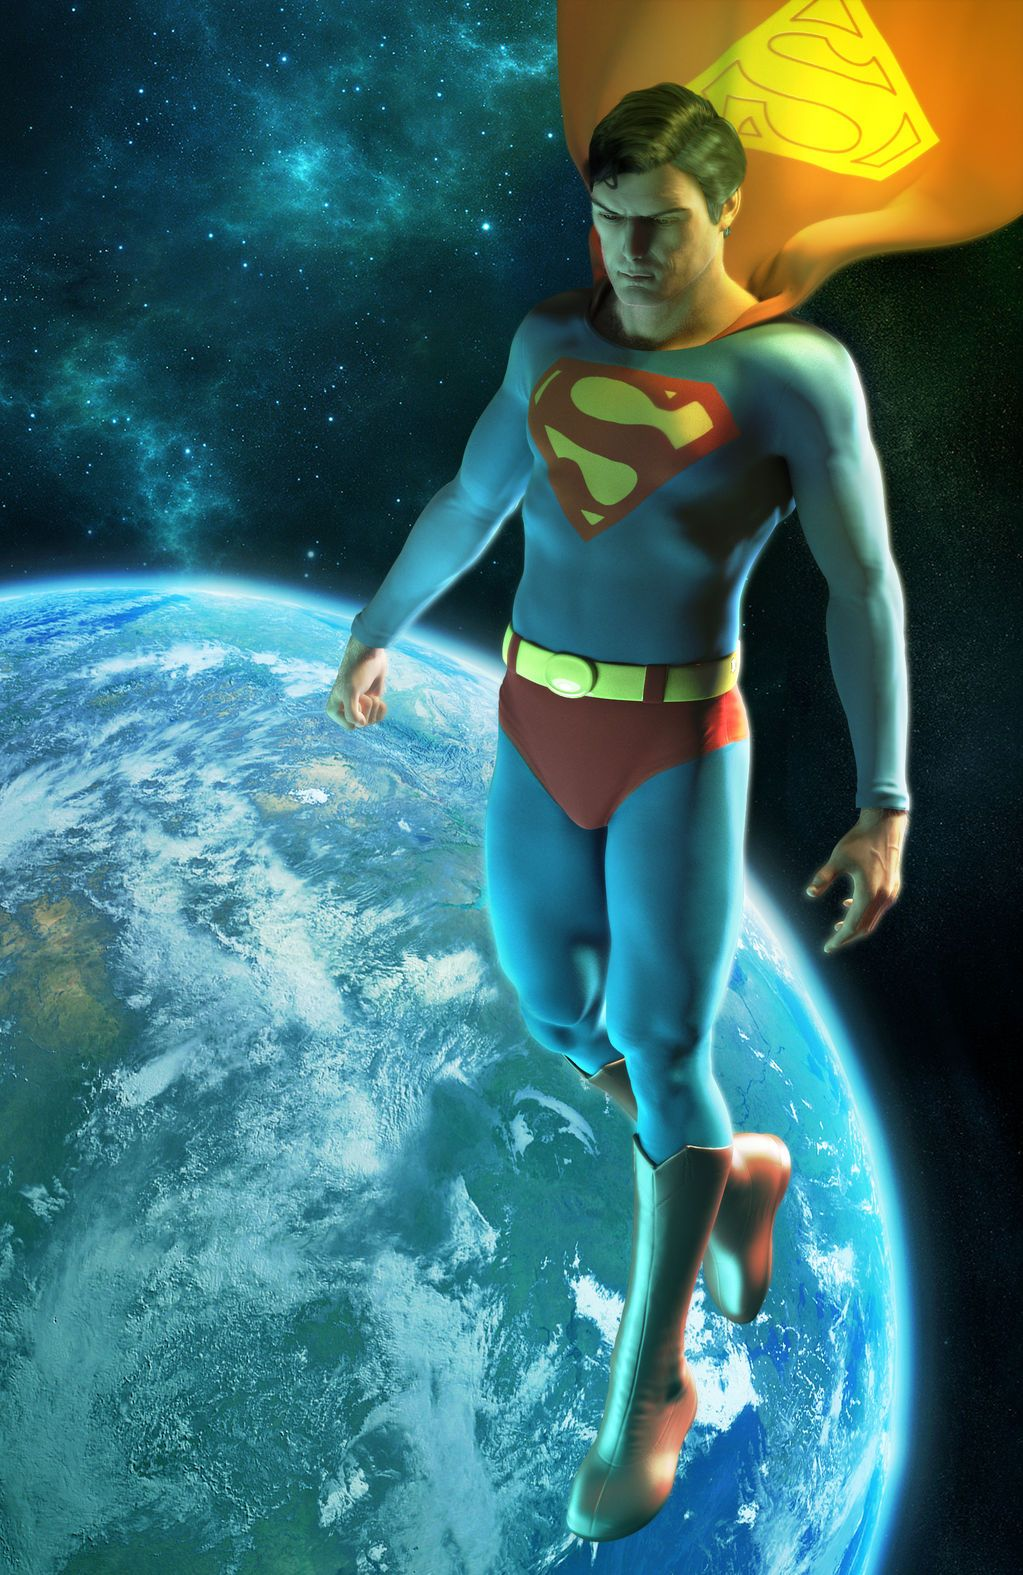 Christopher Reeve - Superman illustration